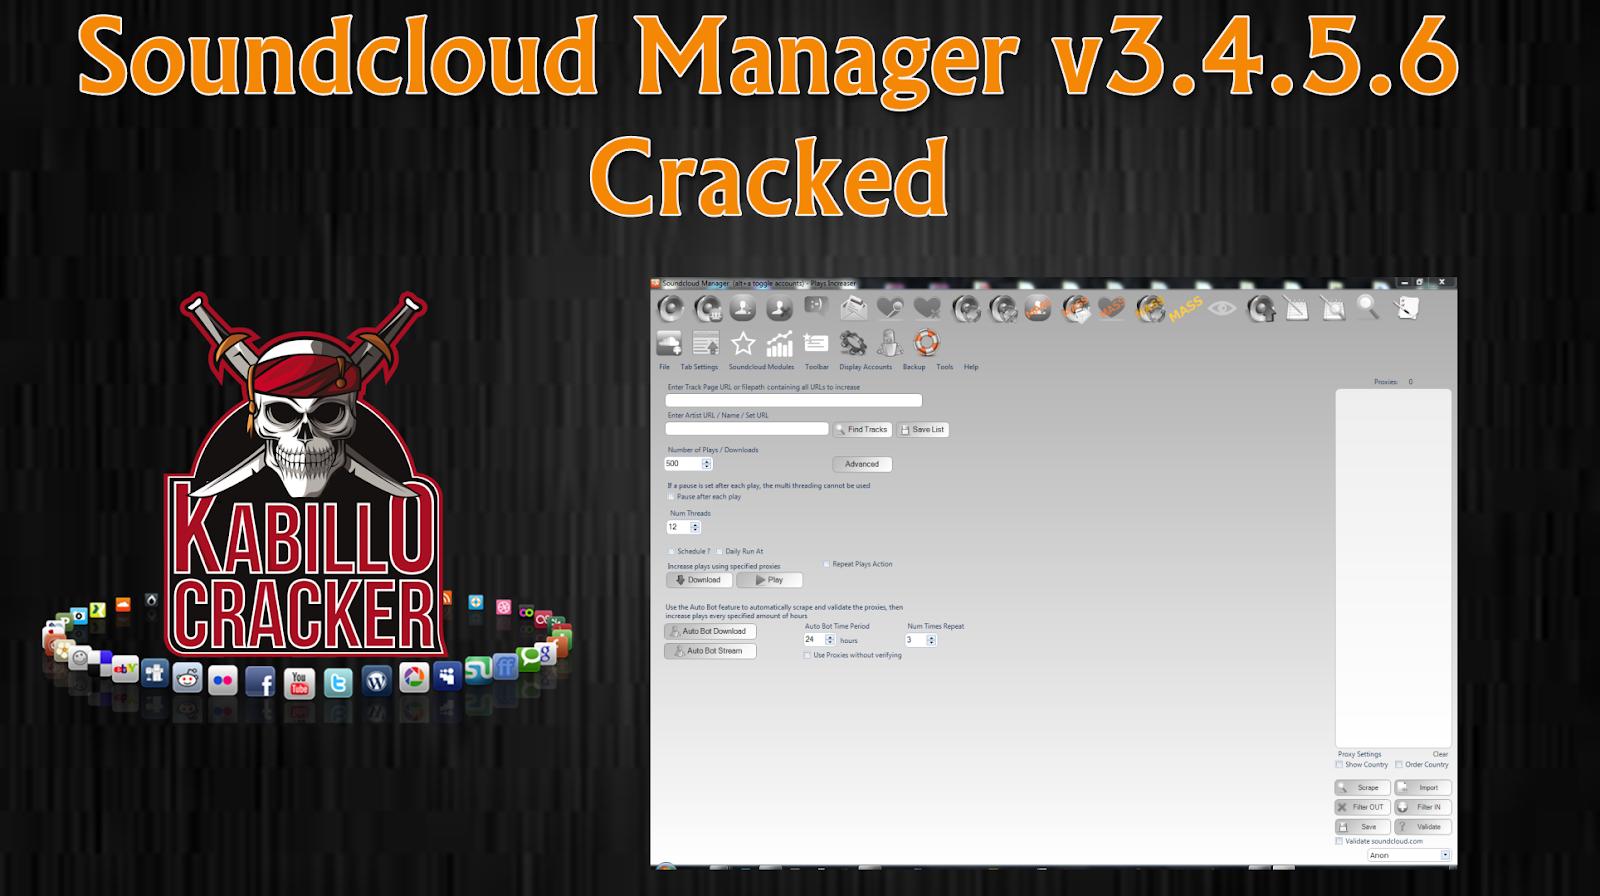 Soundcloud Manager v3 4 5 6 Cracked | silaing mah